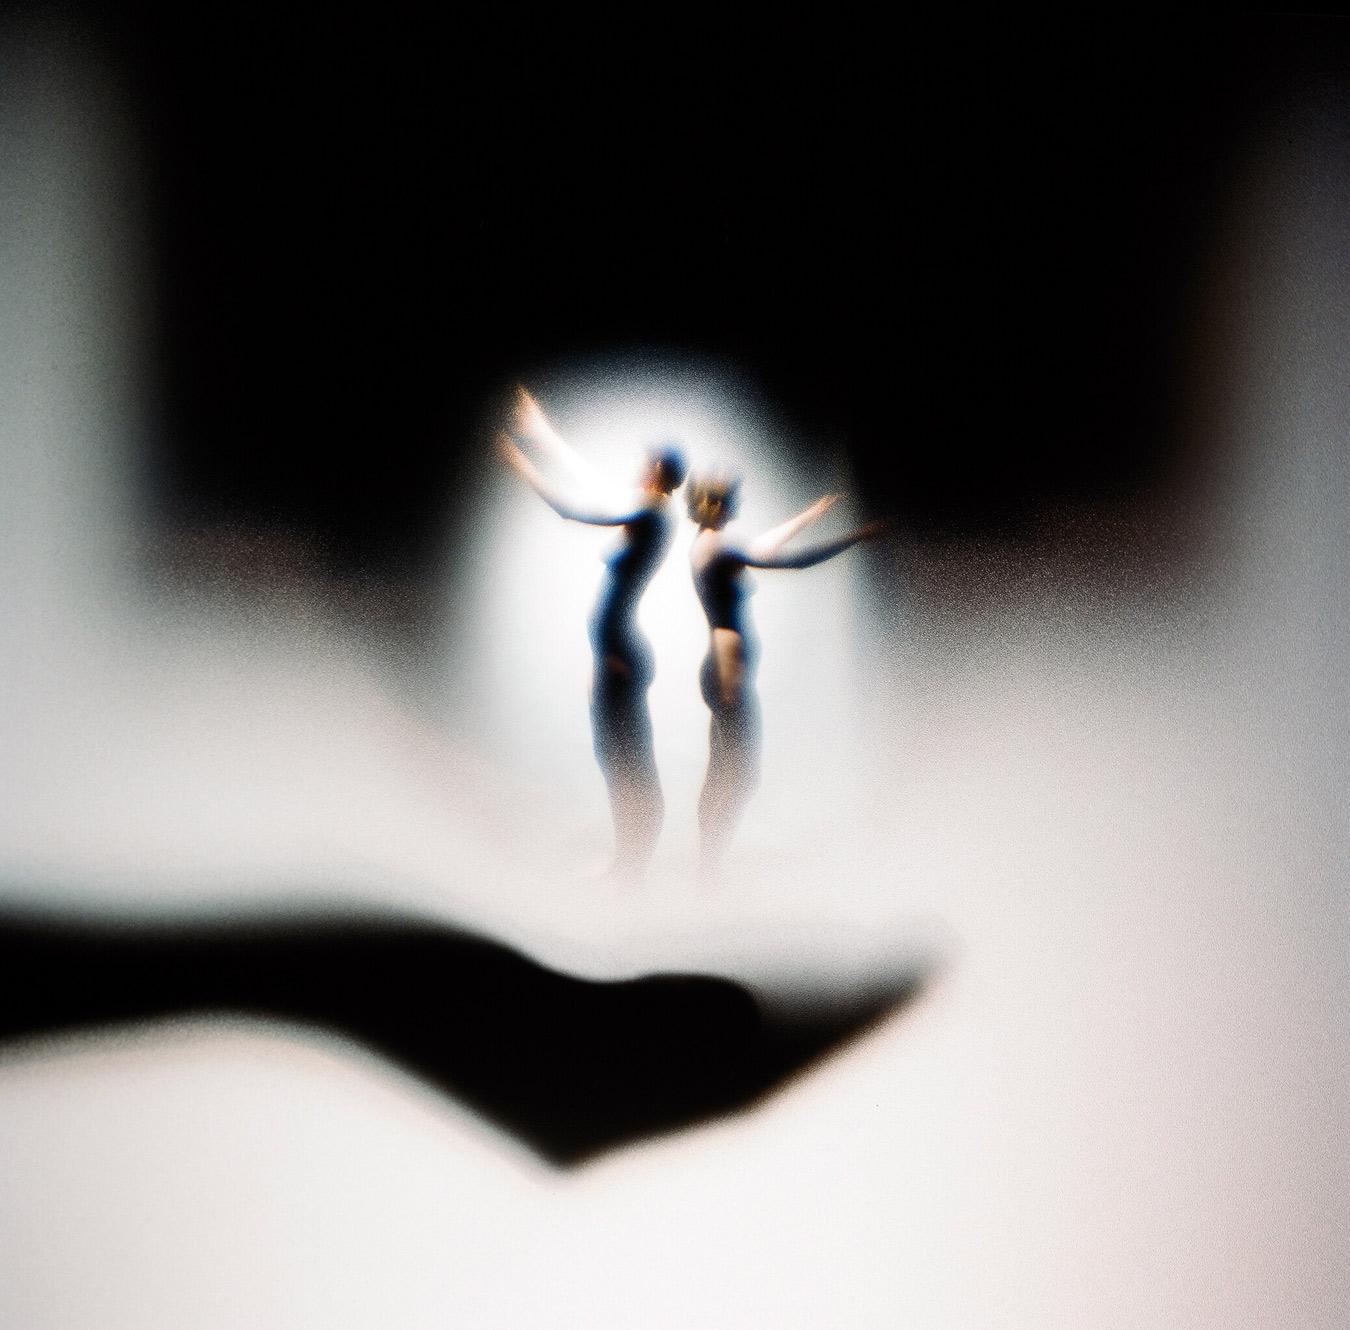 LA SEMILLA DE LA IMAGEN I serie XV. Fotografía analógica, 2009